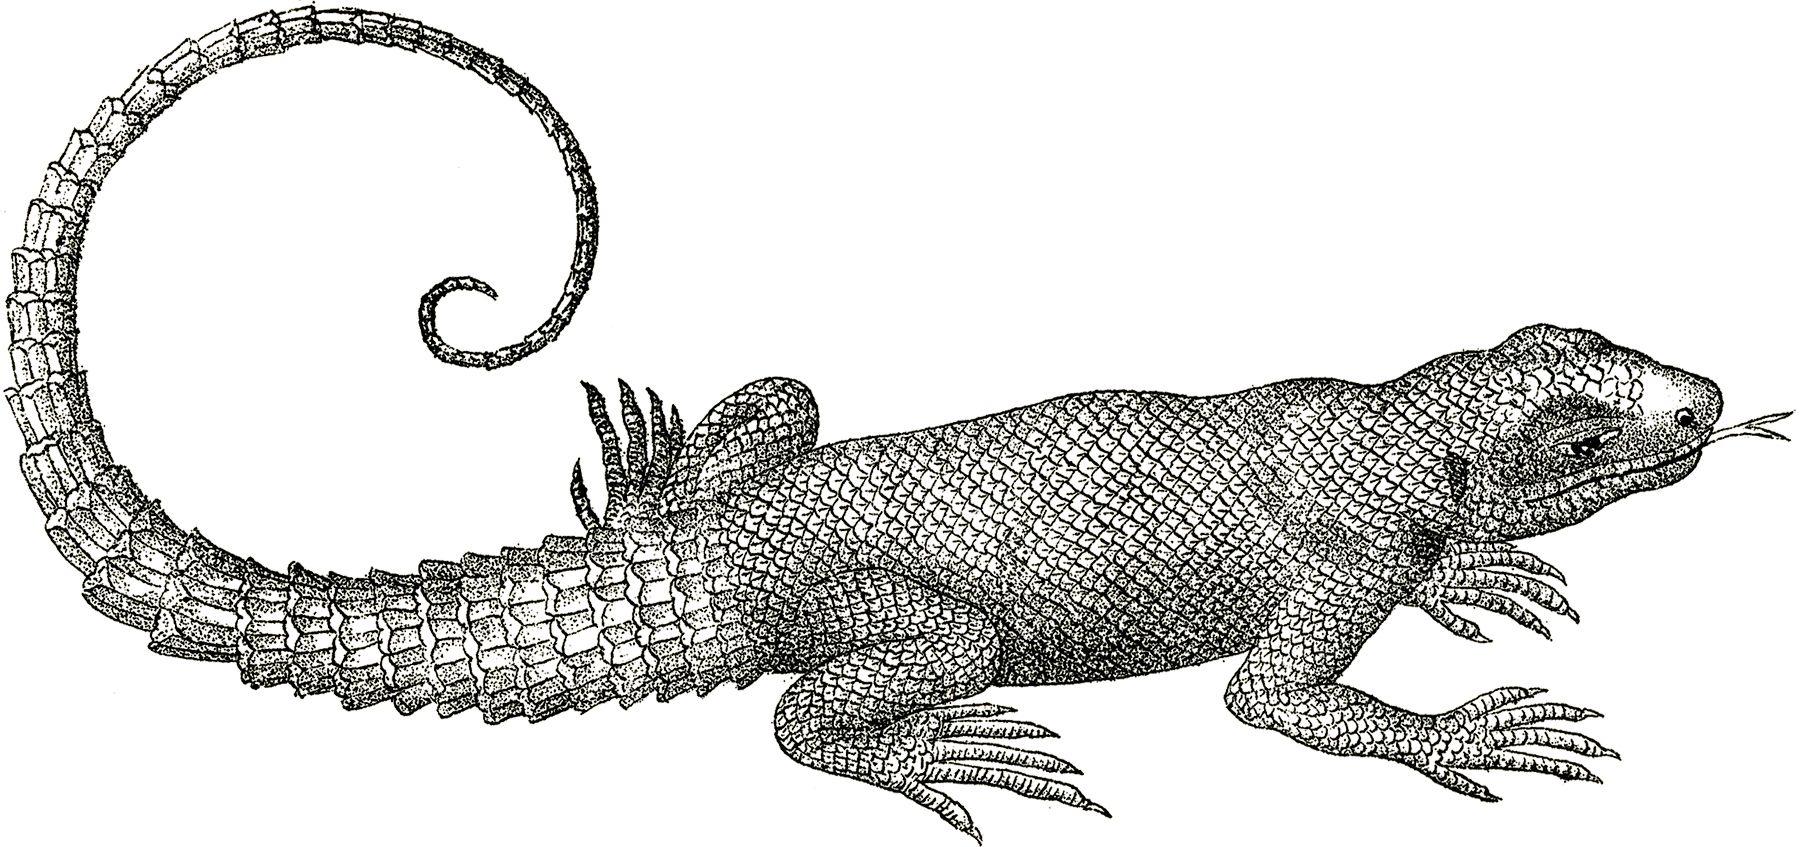 4 Lizard Clipart Images Graphics Fairy Lizard Animal Clipart